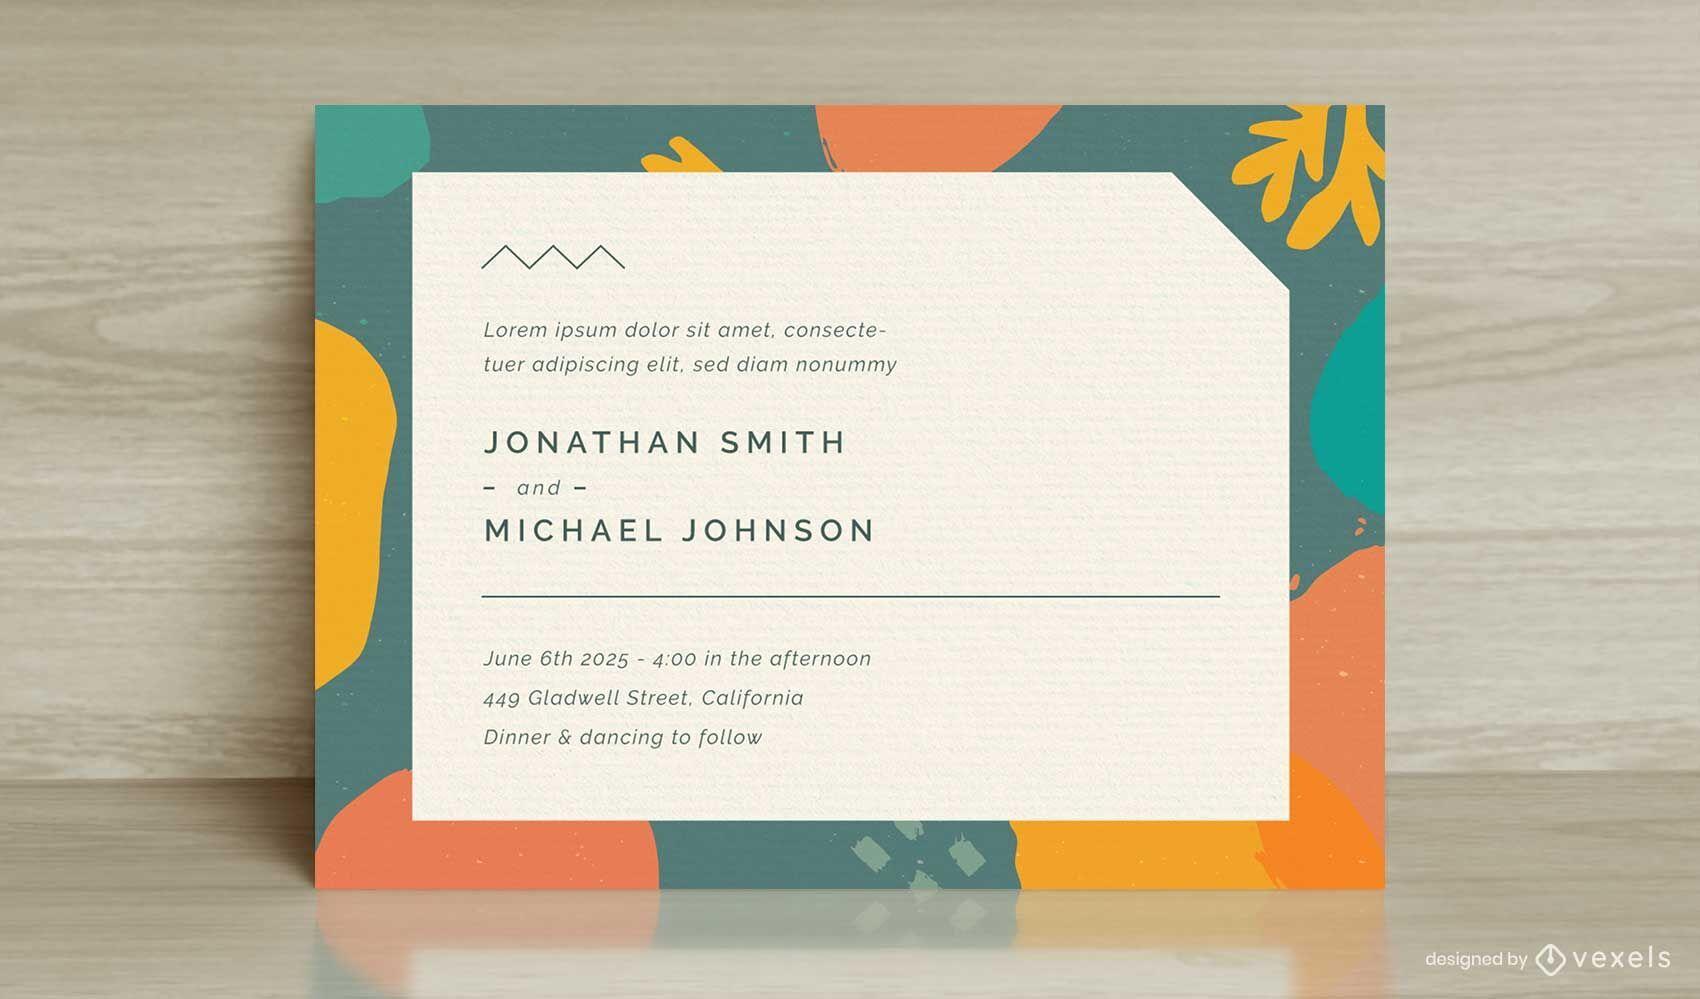 Wedding invitation abstract template